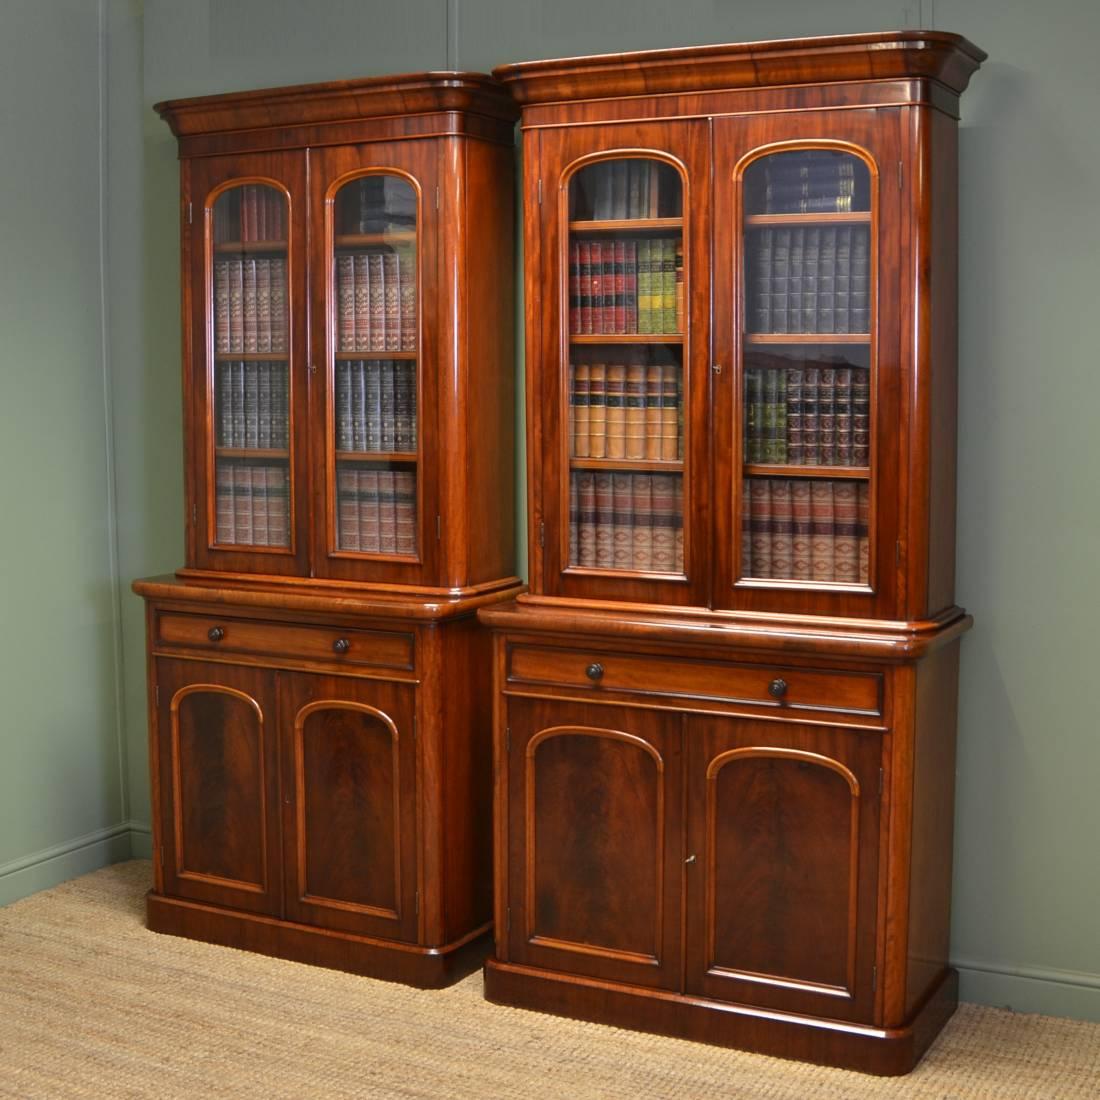 Antique Bookshelves: Fabulous Quality Unusual Pair Of Victorian Mahogany